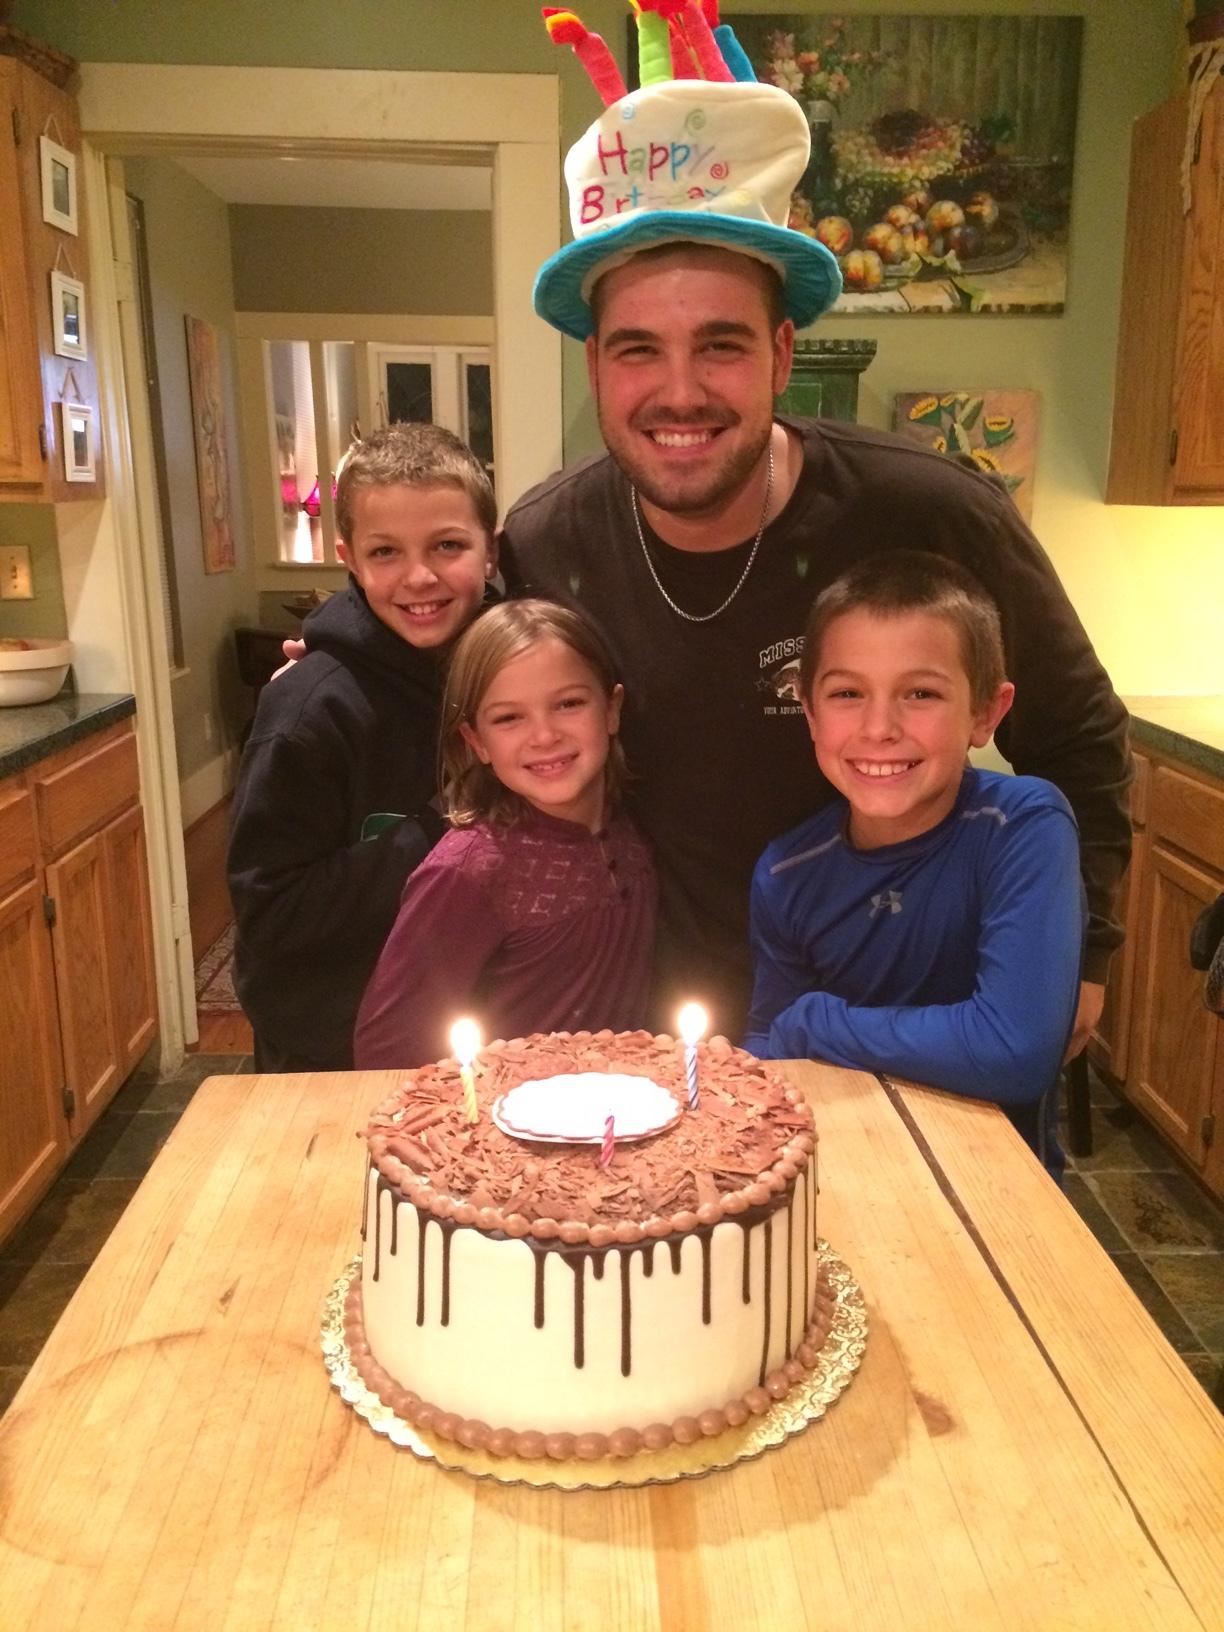 celebrating my nephew's birthday